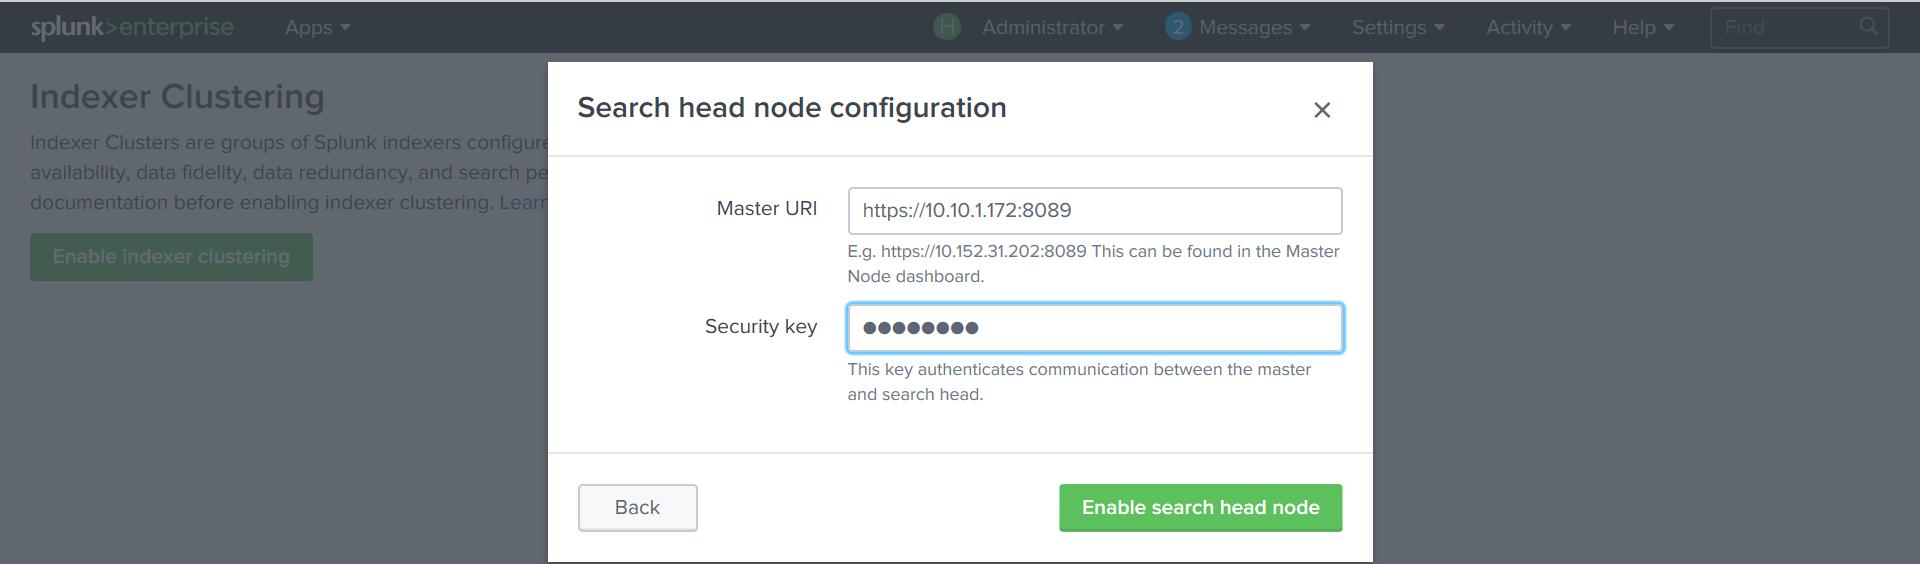 Splunk Distributed Search. Или как построить Indexer кластер на Splunk? - 7